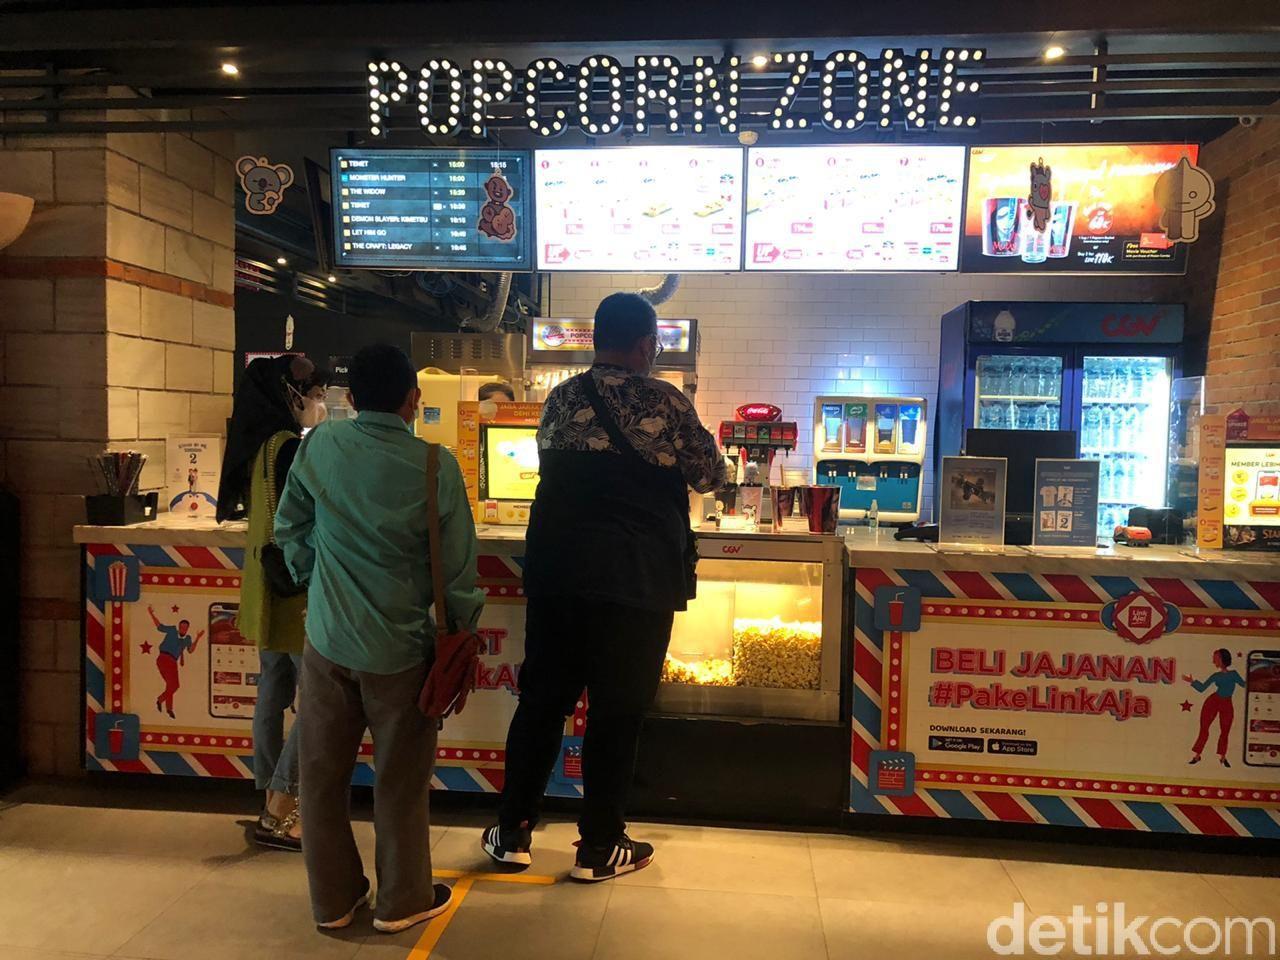 Suasana Bioskop Jelang Long Weekend